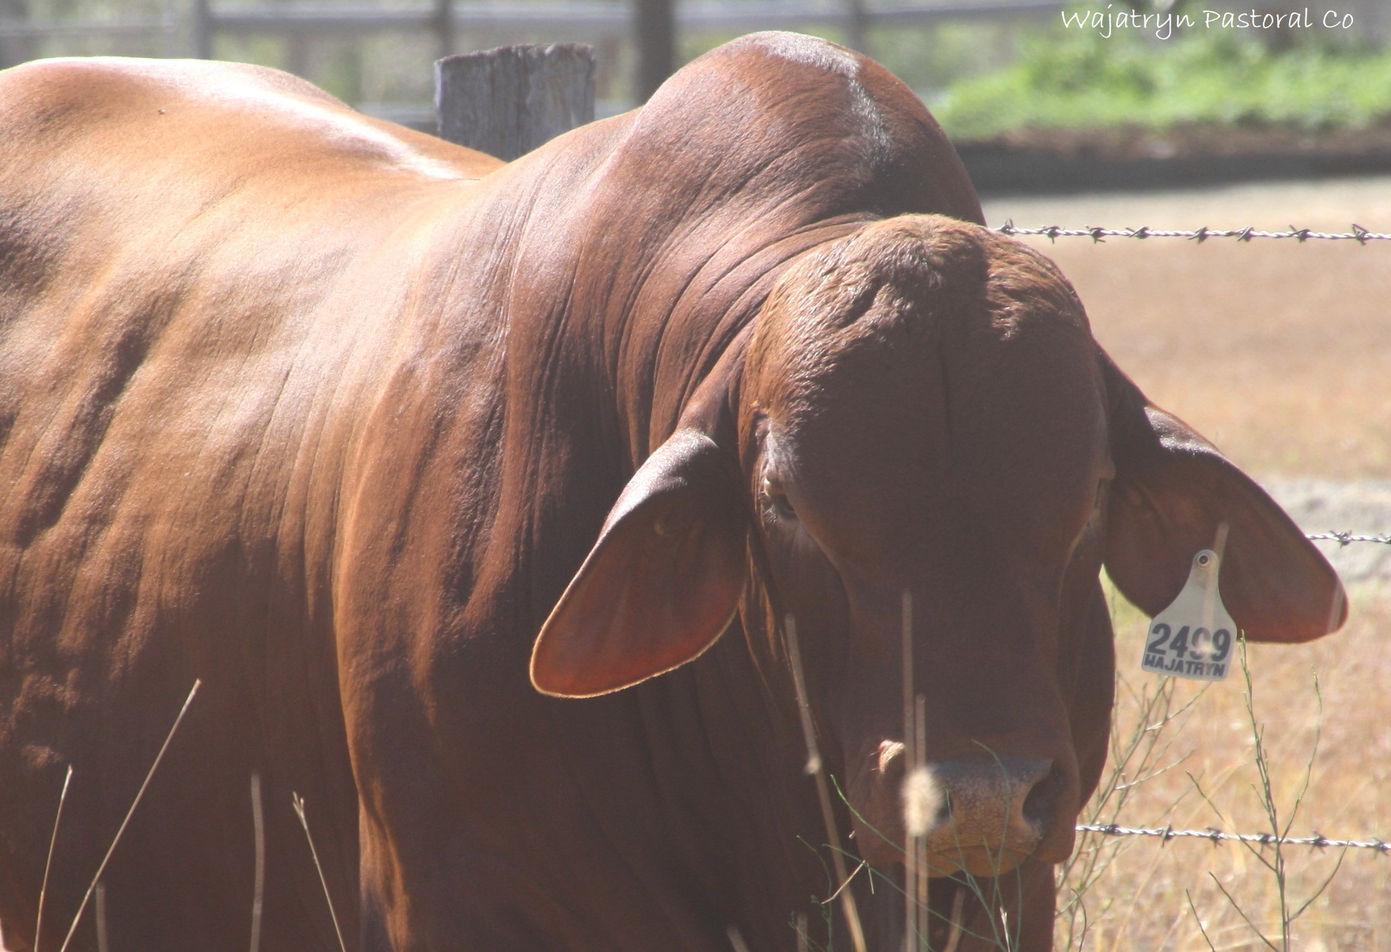 Wajatryn bull topline n beef.jpg